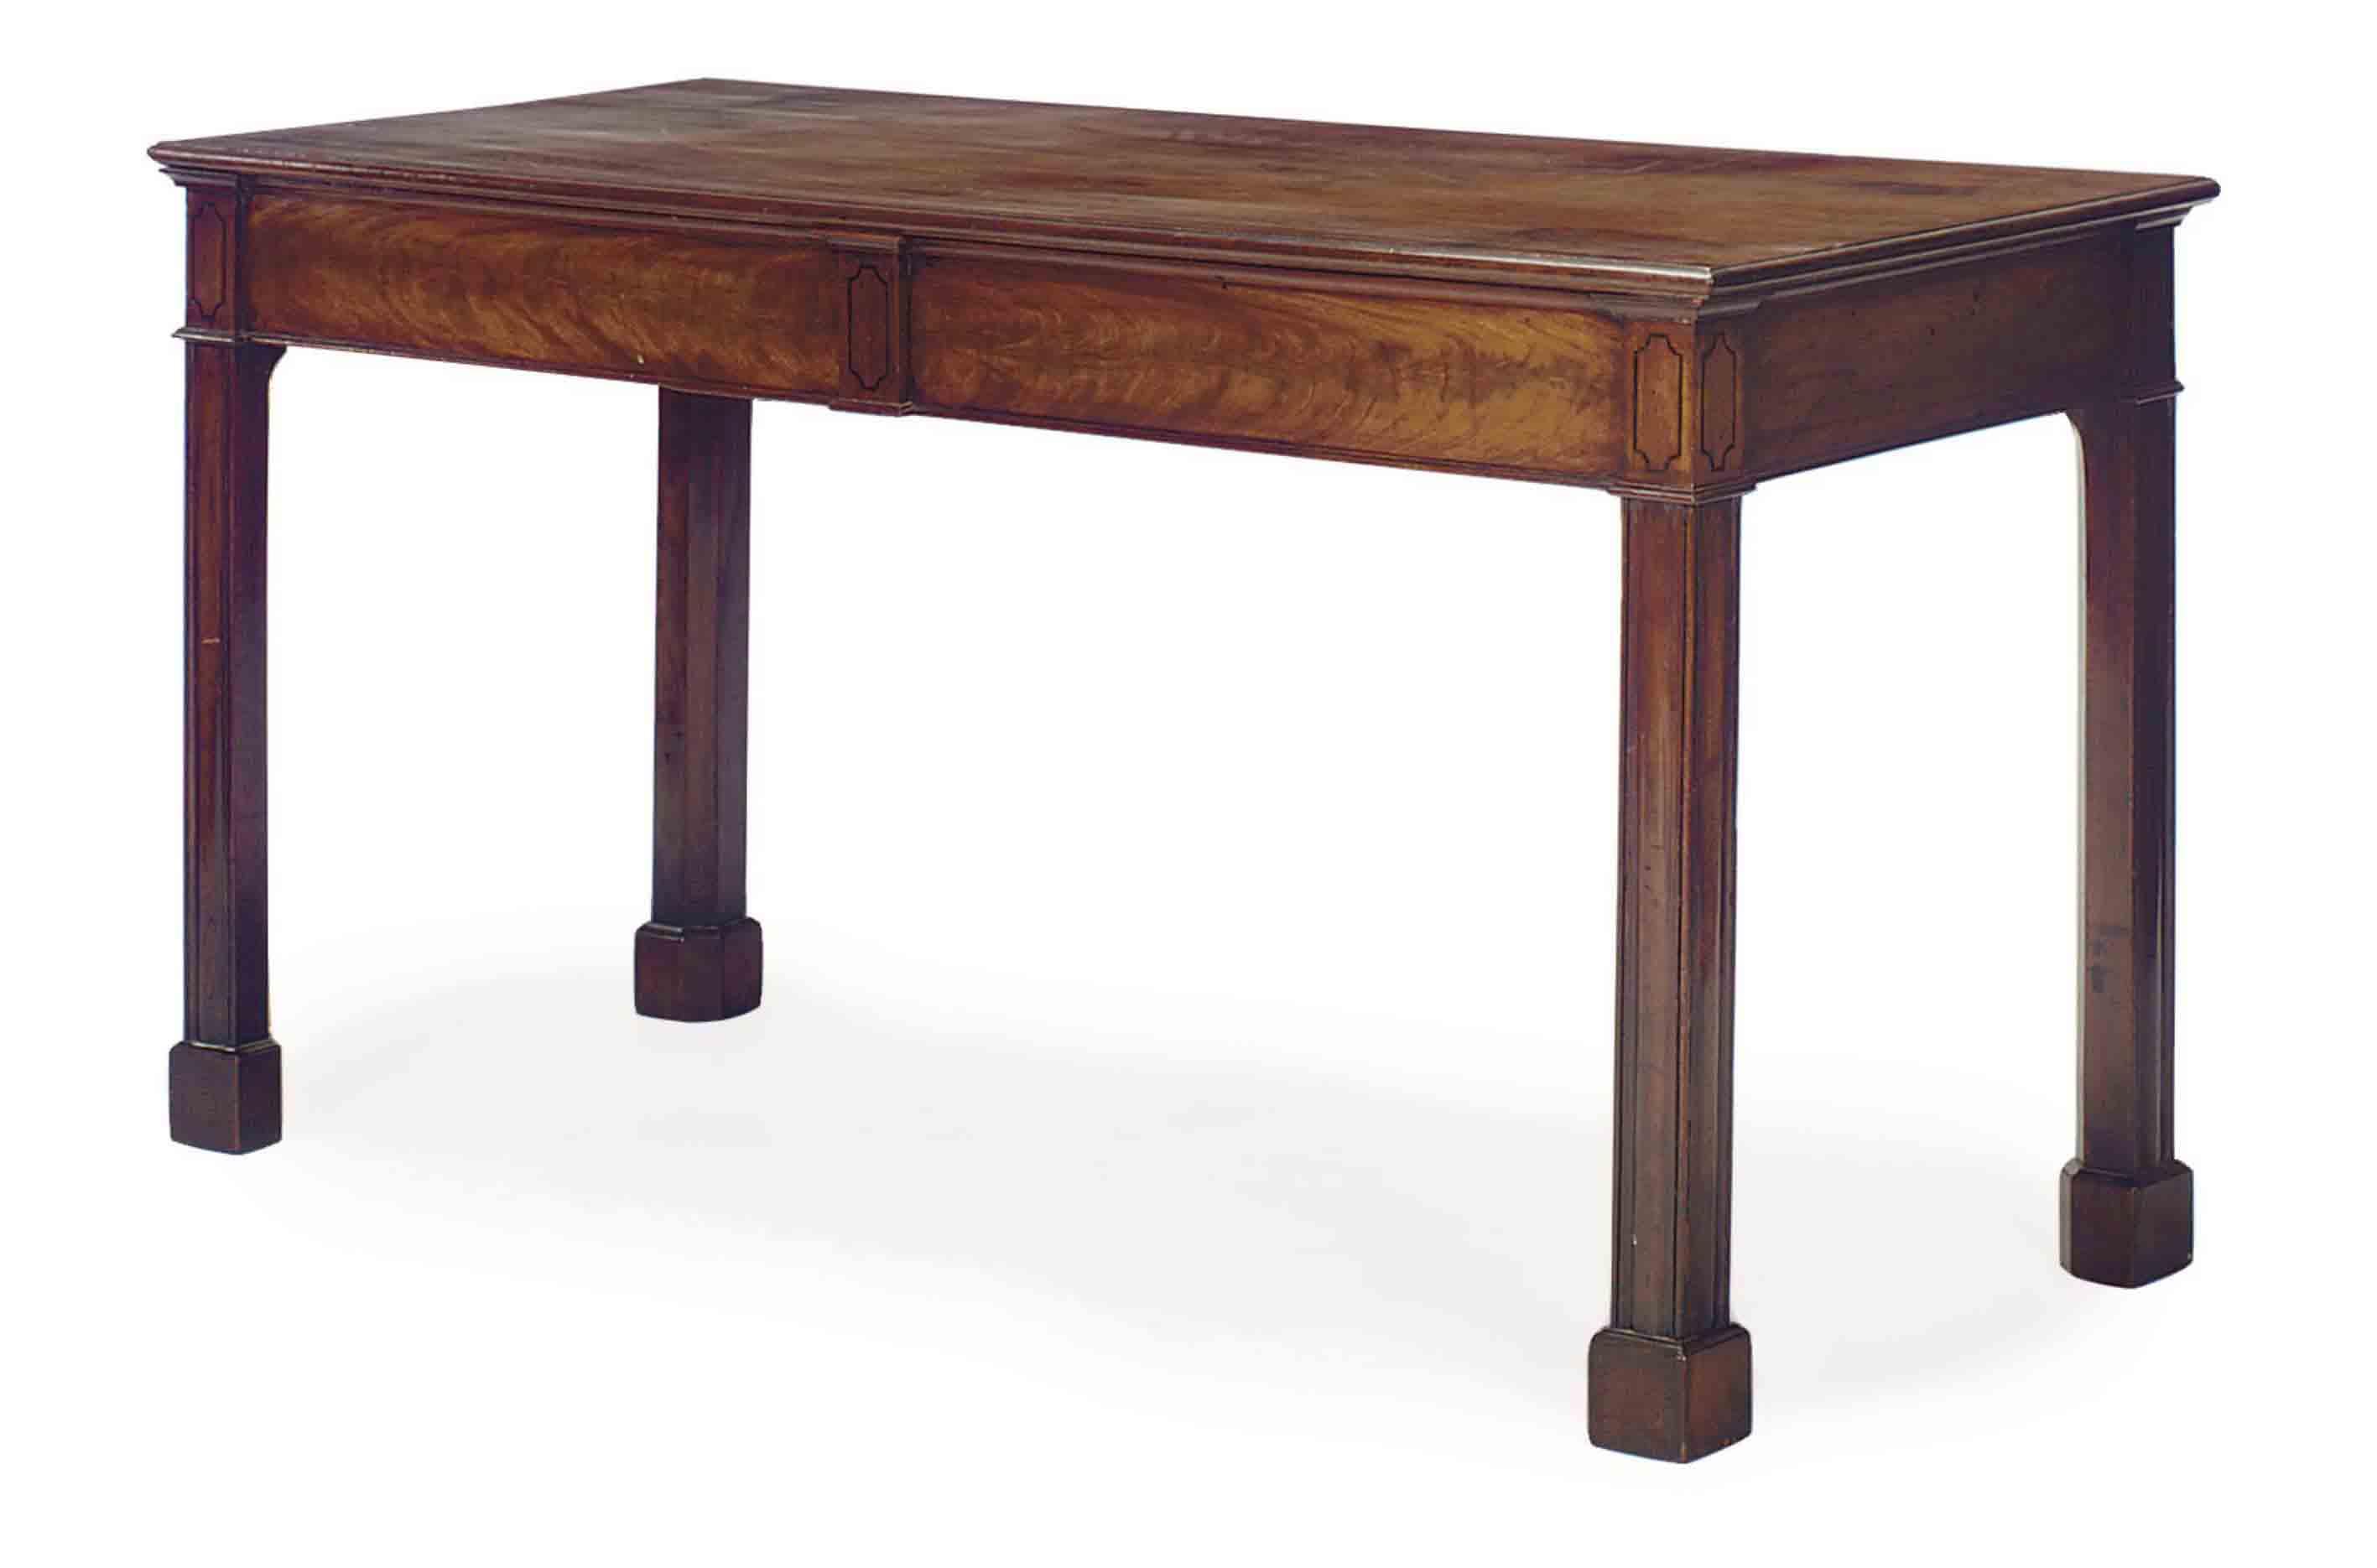 A GEORGE III MAHOGANY SIDE TABLE,